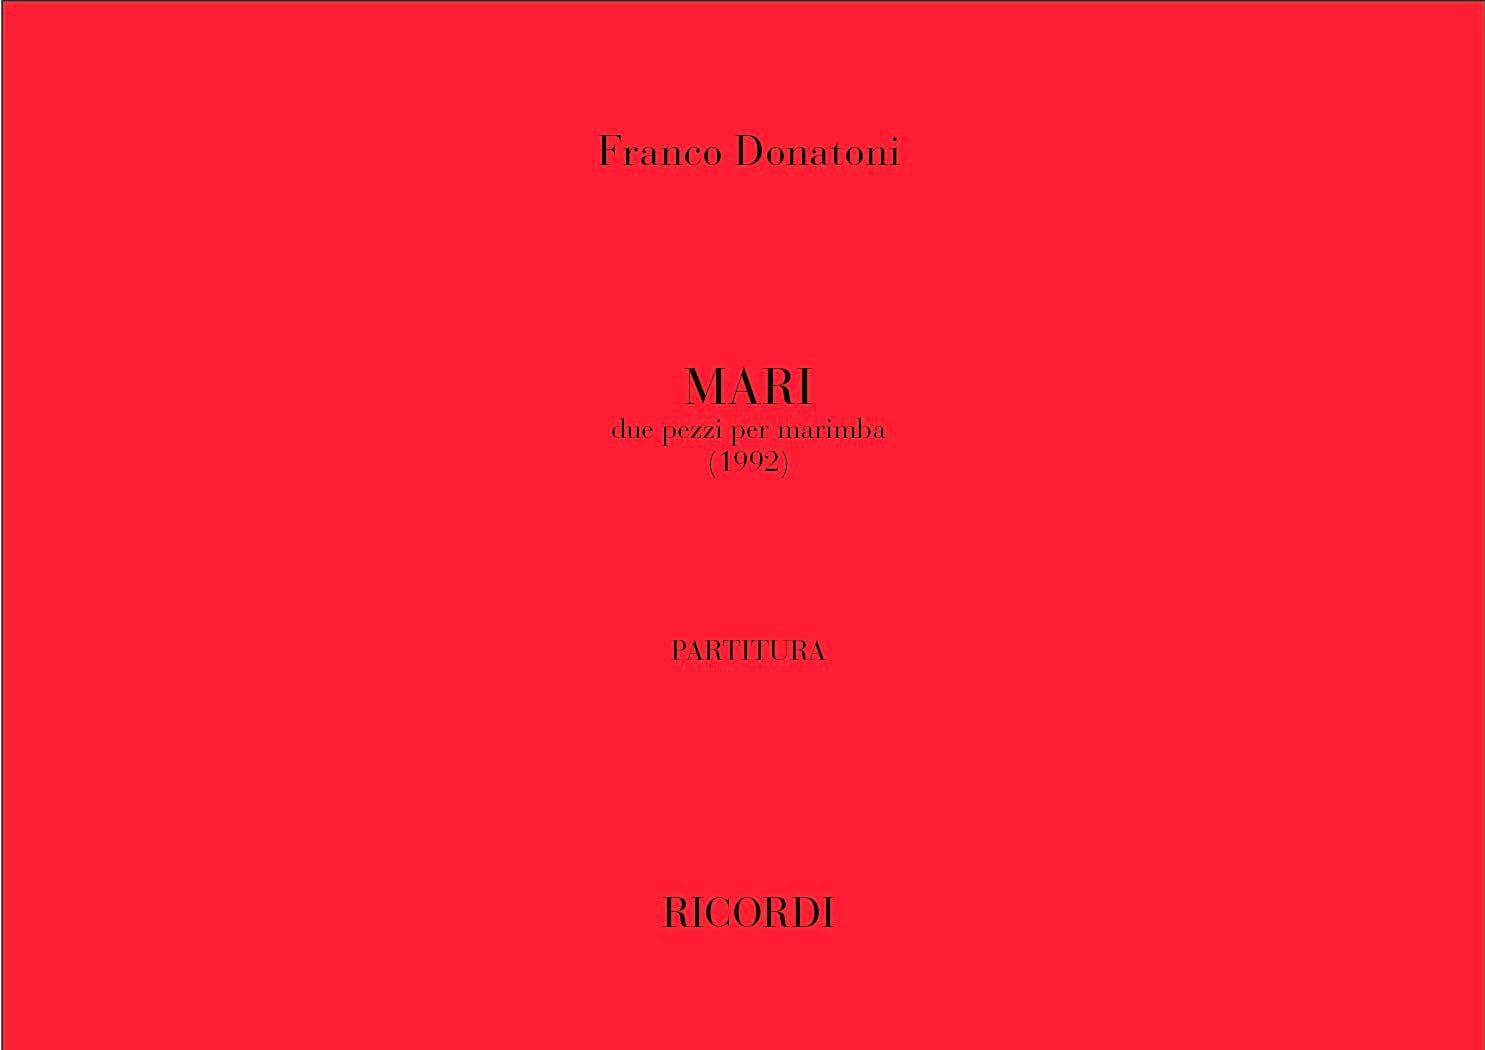 Mari - Franco Donatoni - Partition - Marimba - laflutedepan.com